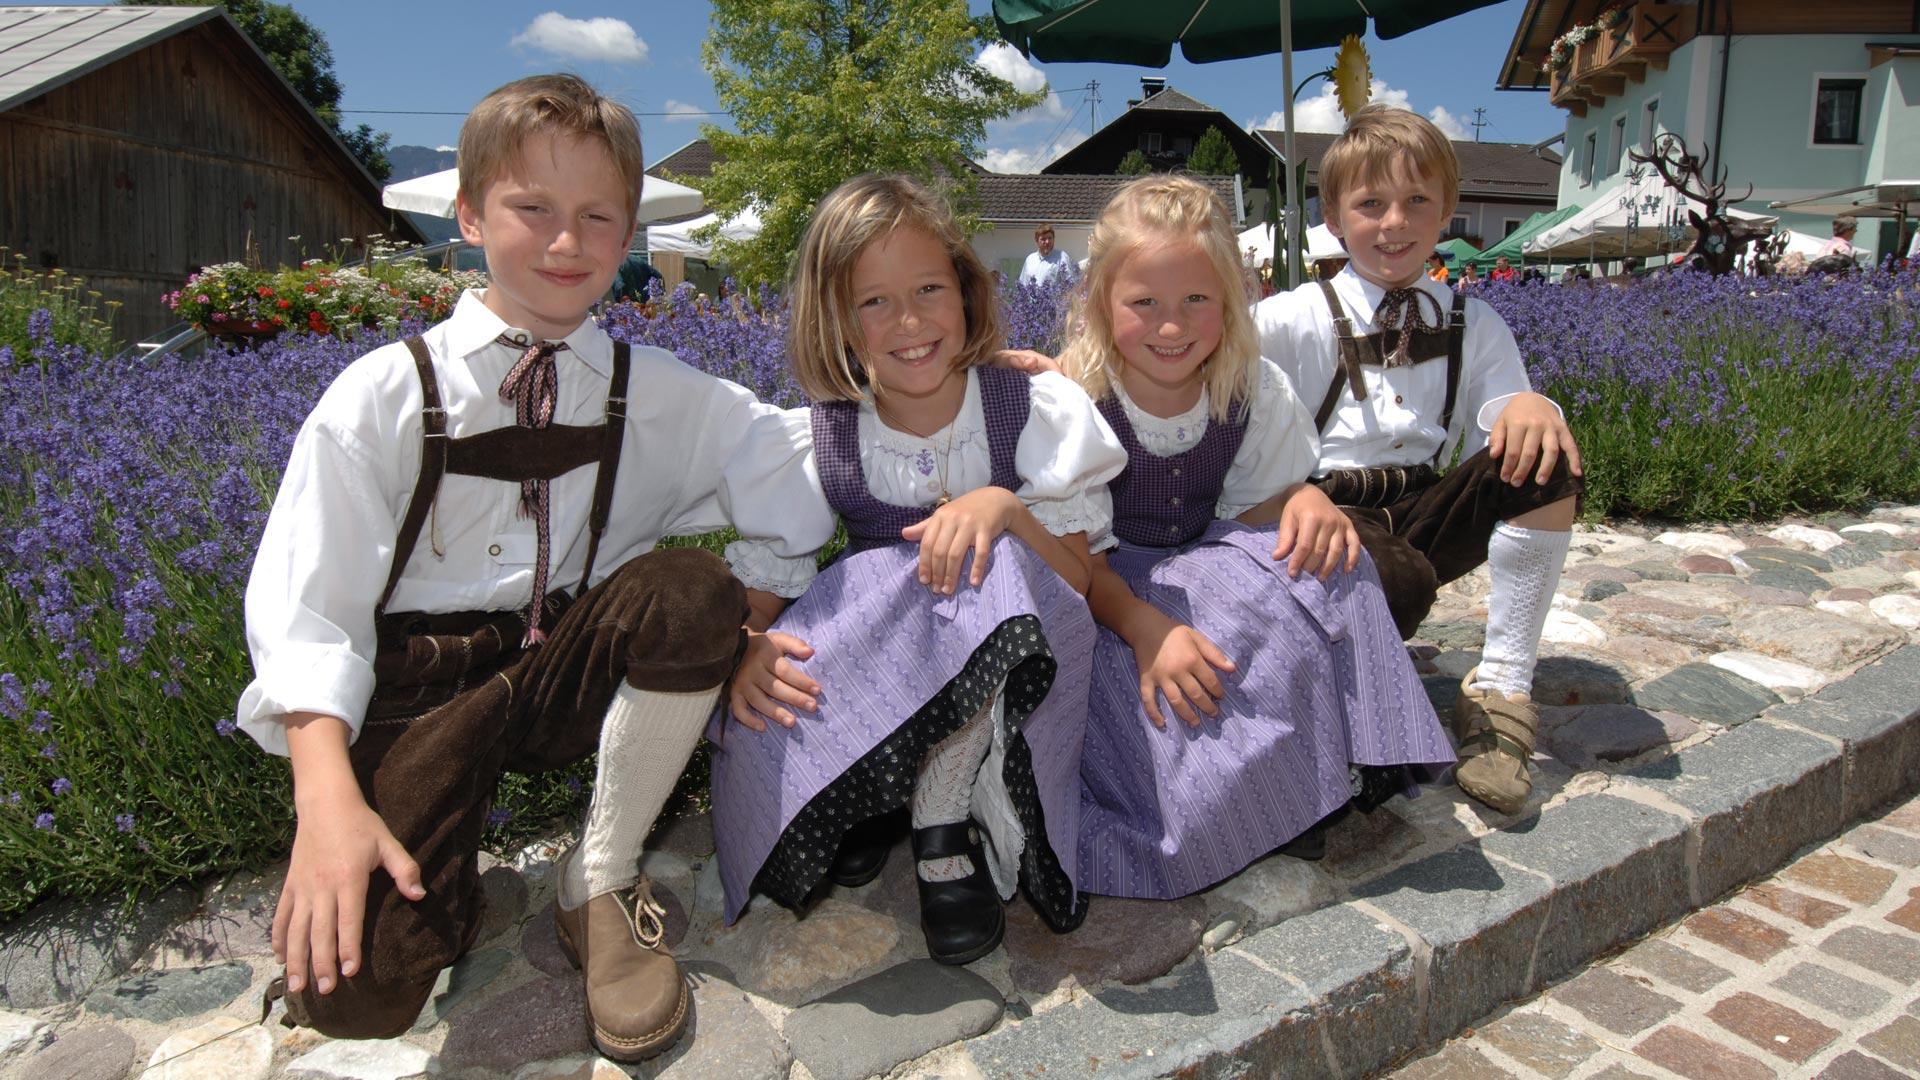 LAG-GG-Kraeuterfest-Kinder